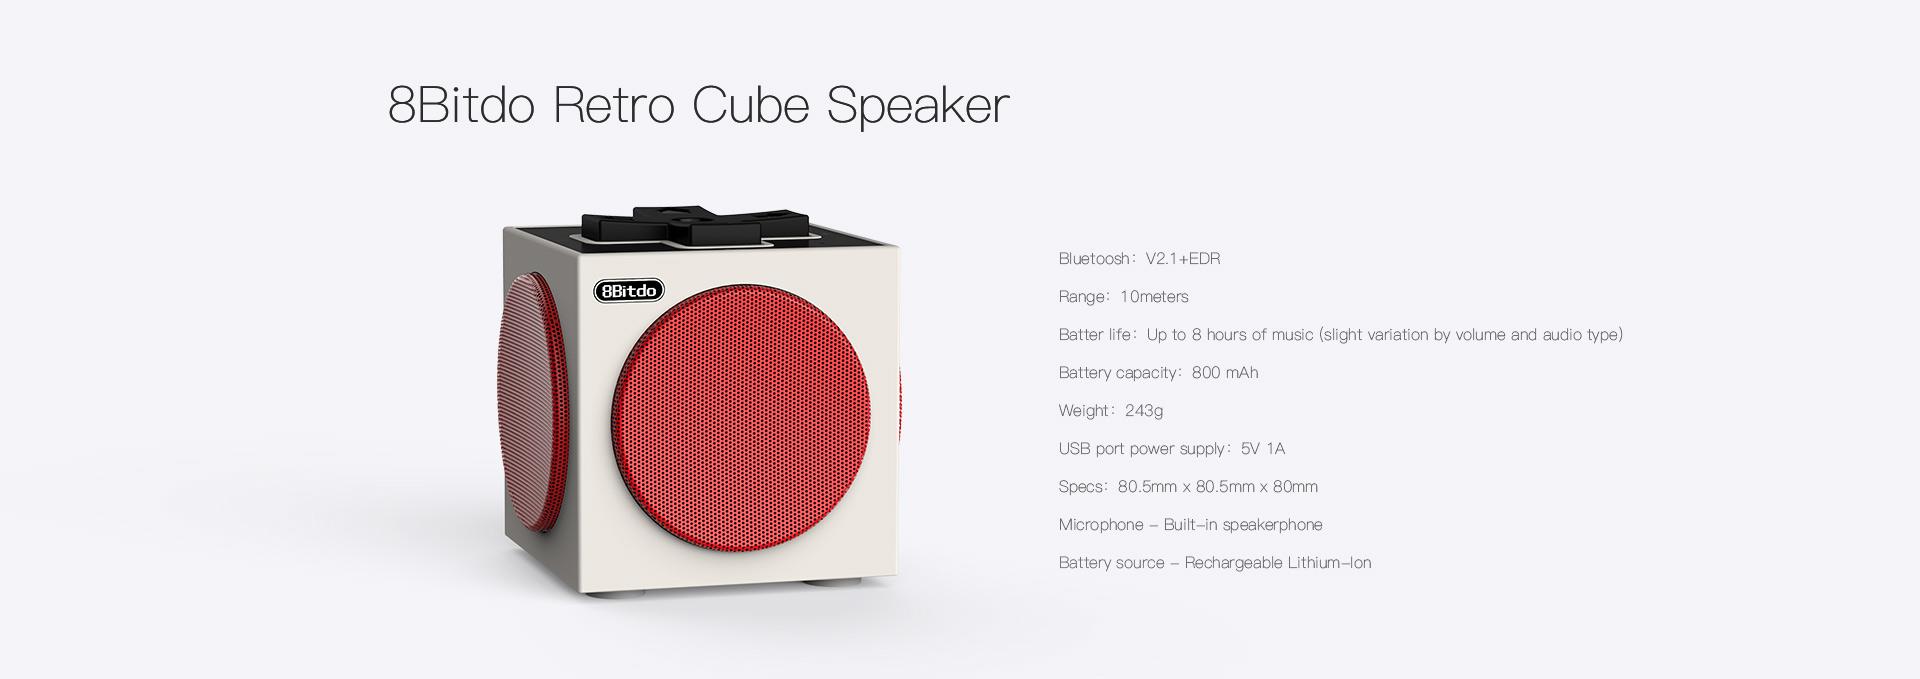 8Bitdo-Retro-Cube-Belchine-9